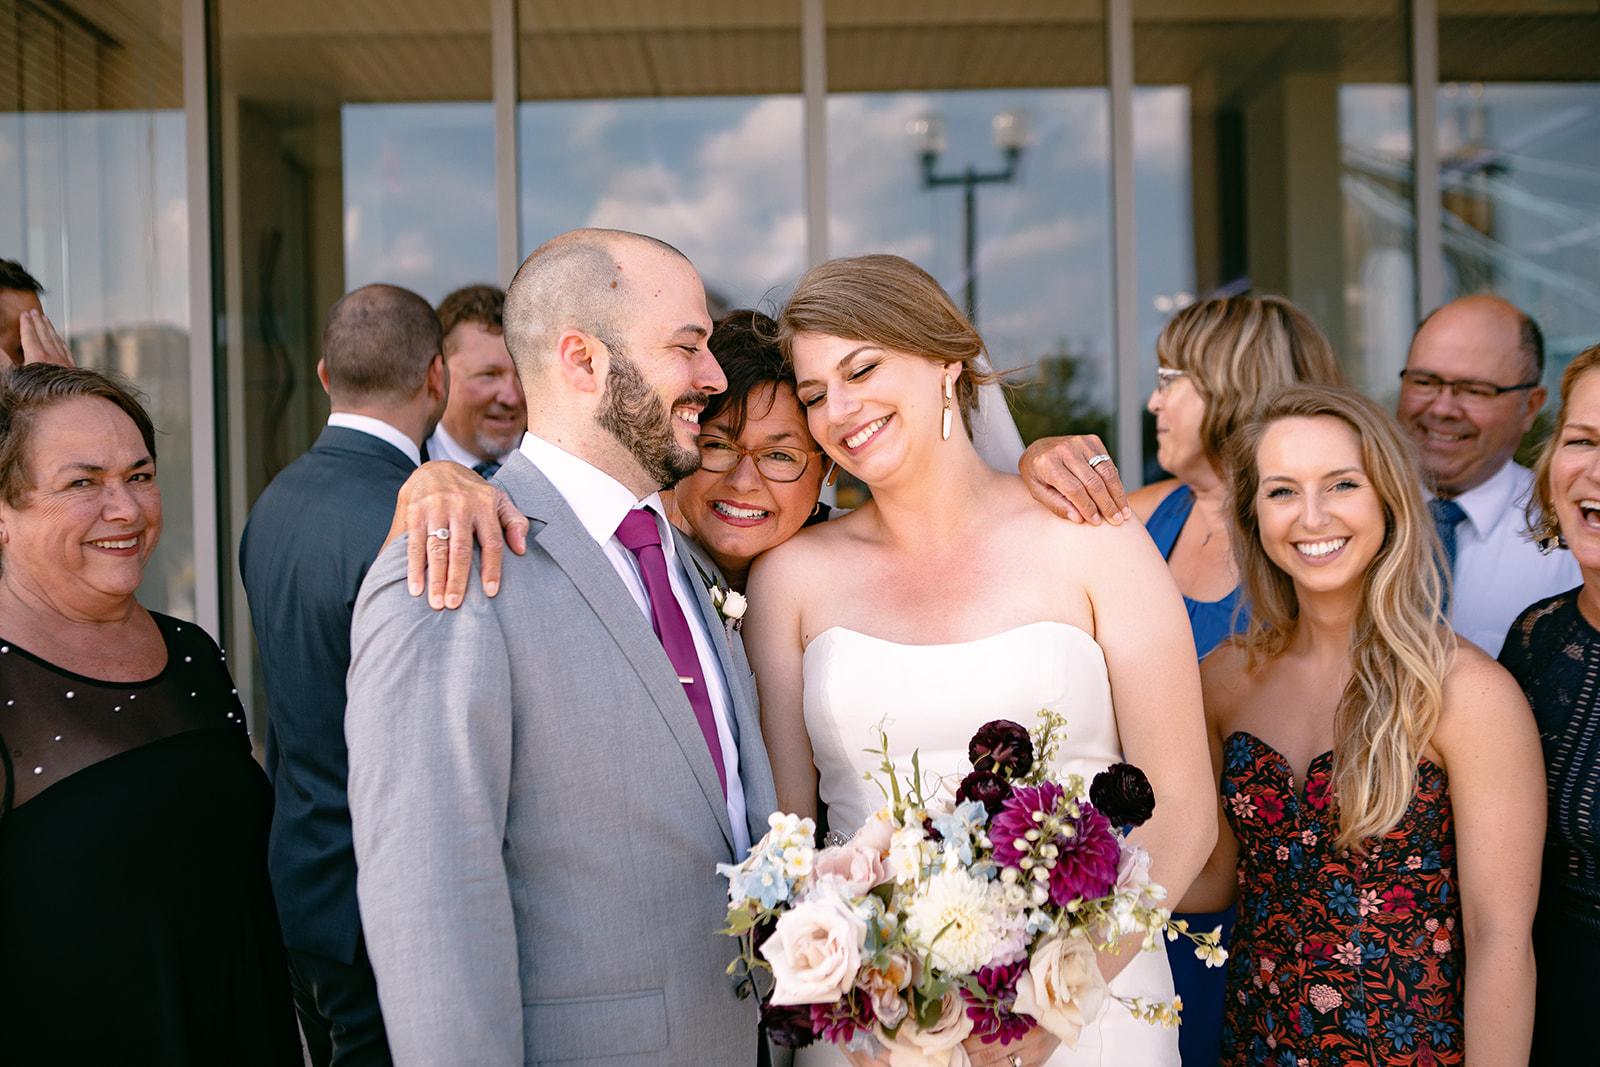 Cincinnati wedding celebration in summer at Roebling Bridge